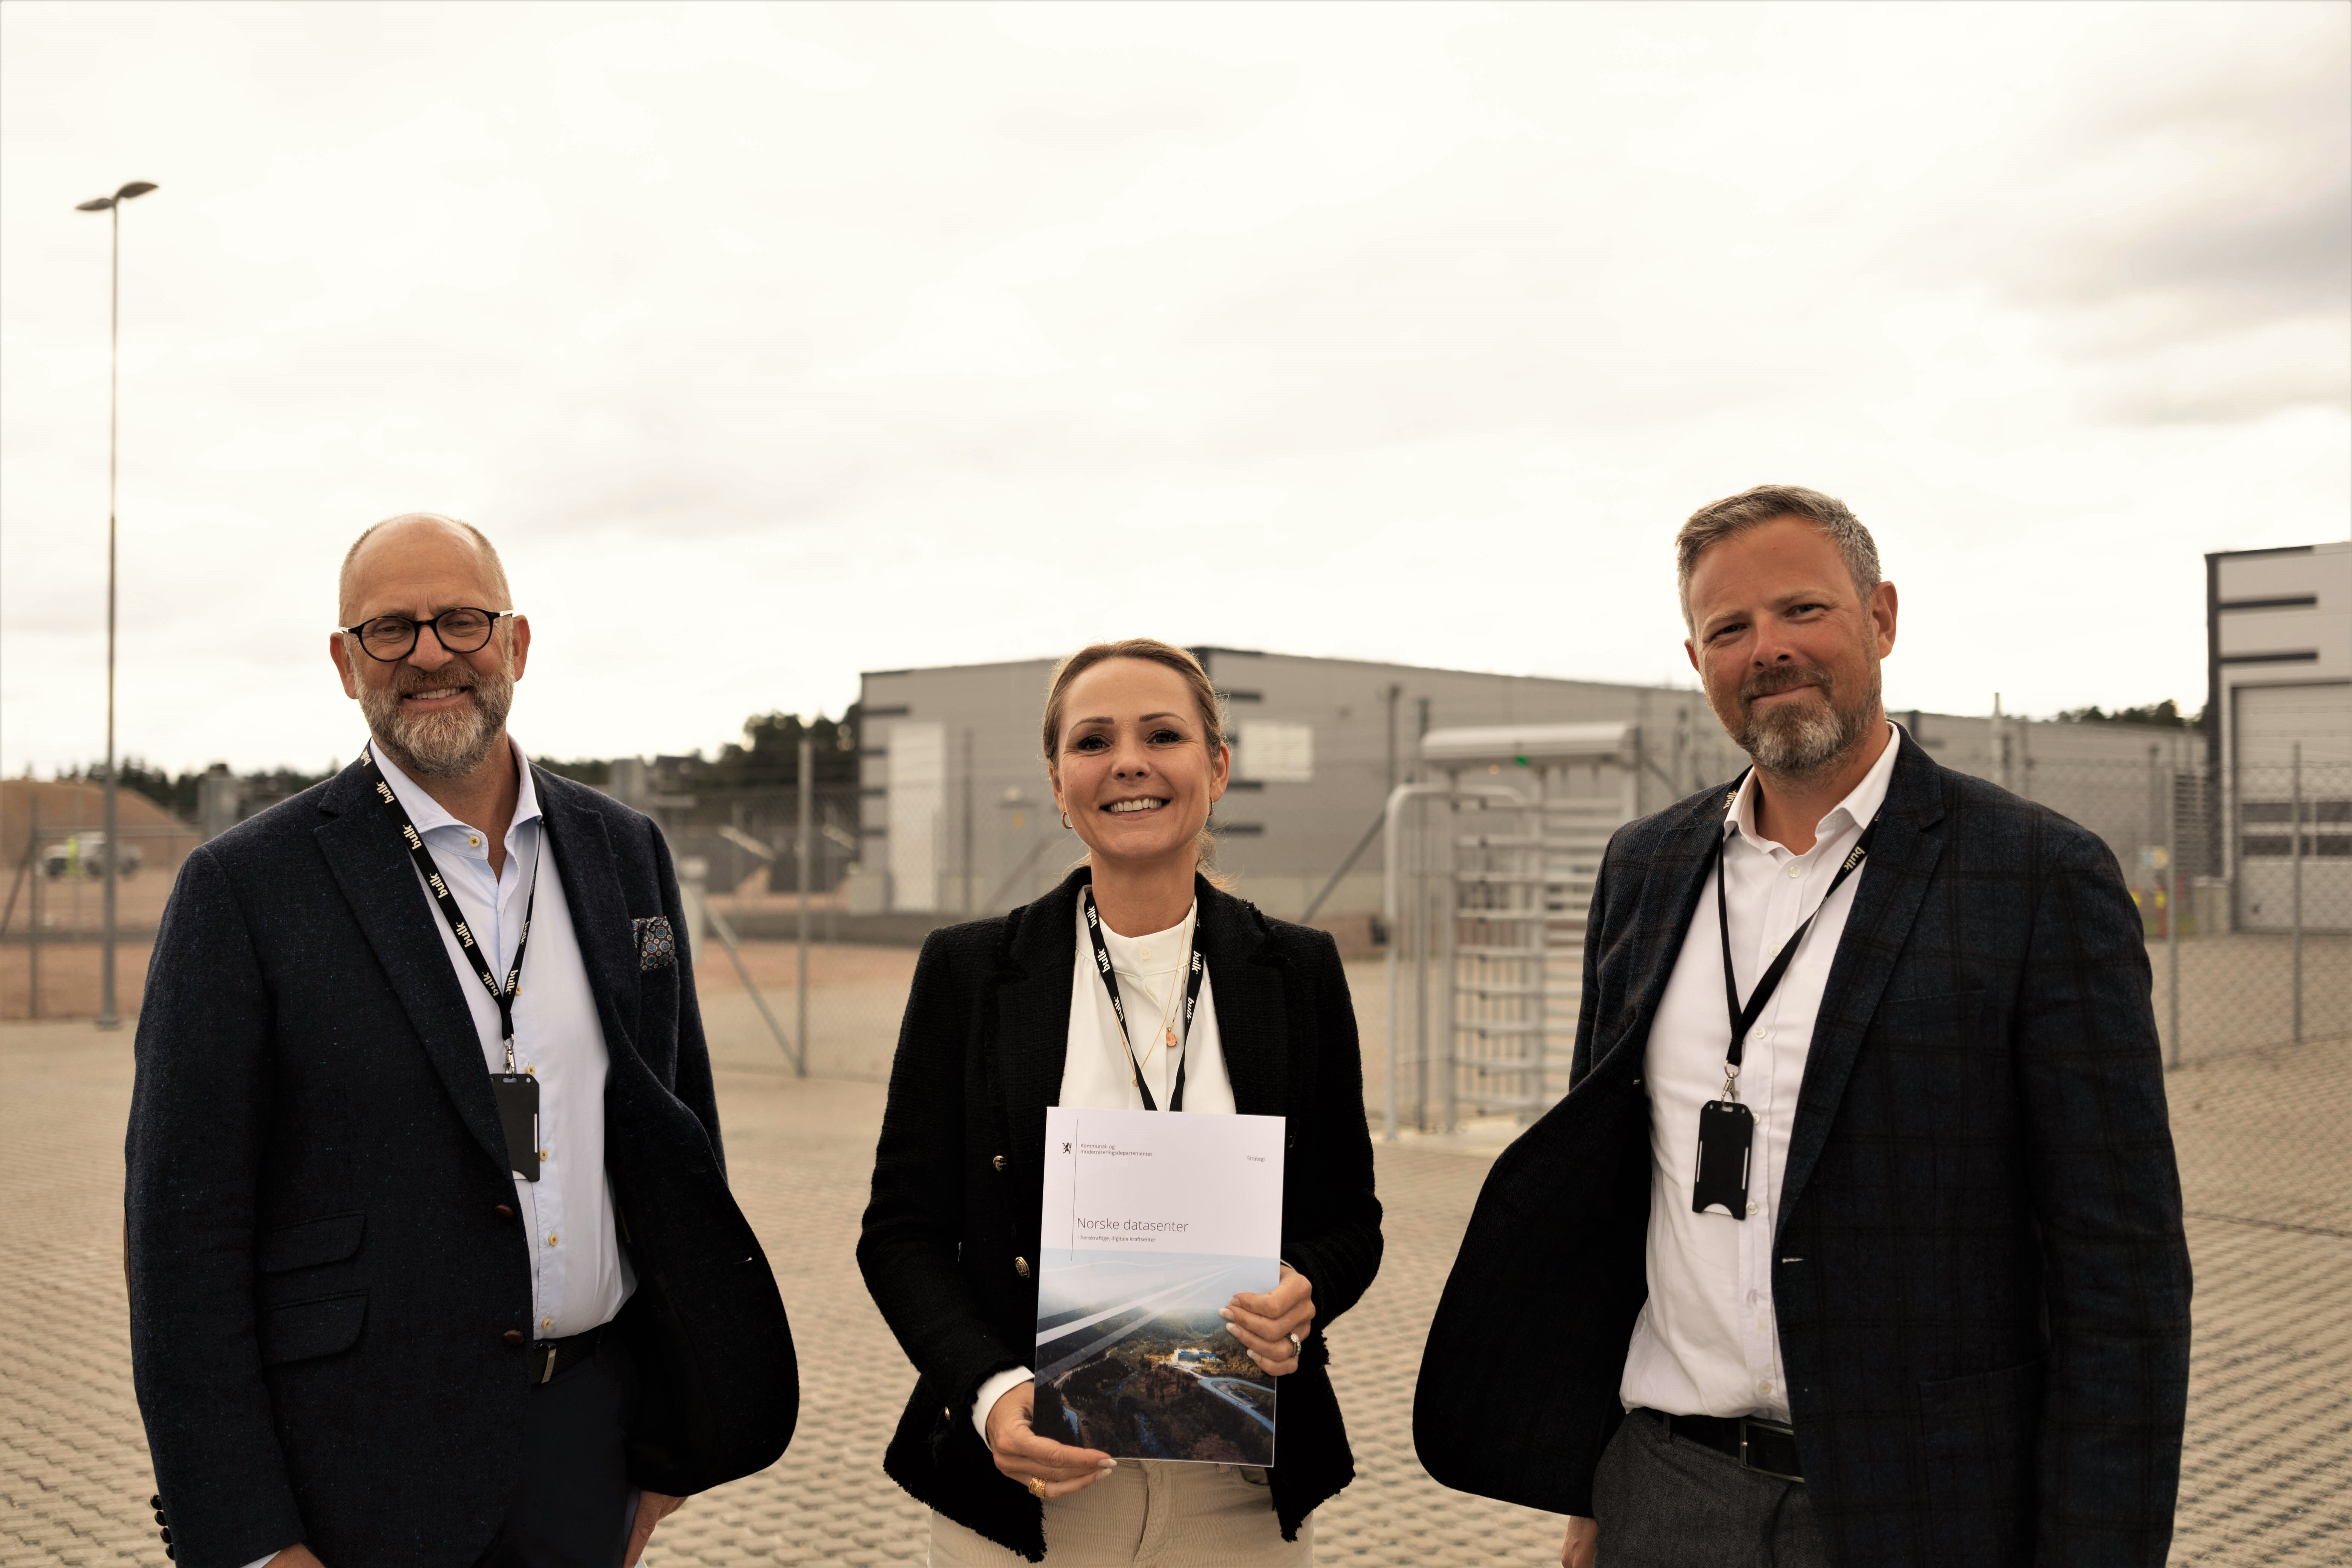 Minister Helleland visited N01 Campus